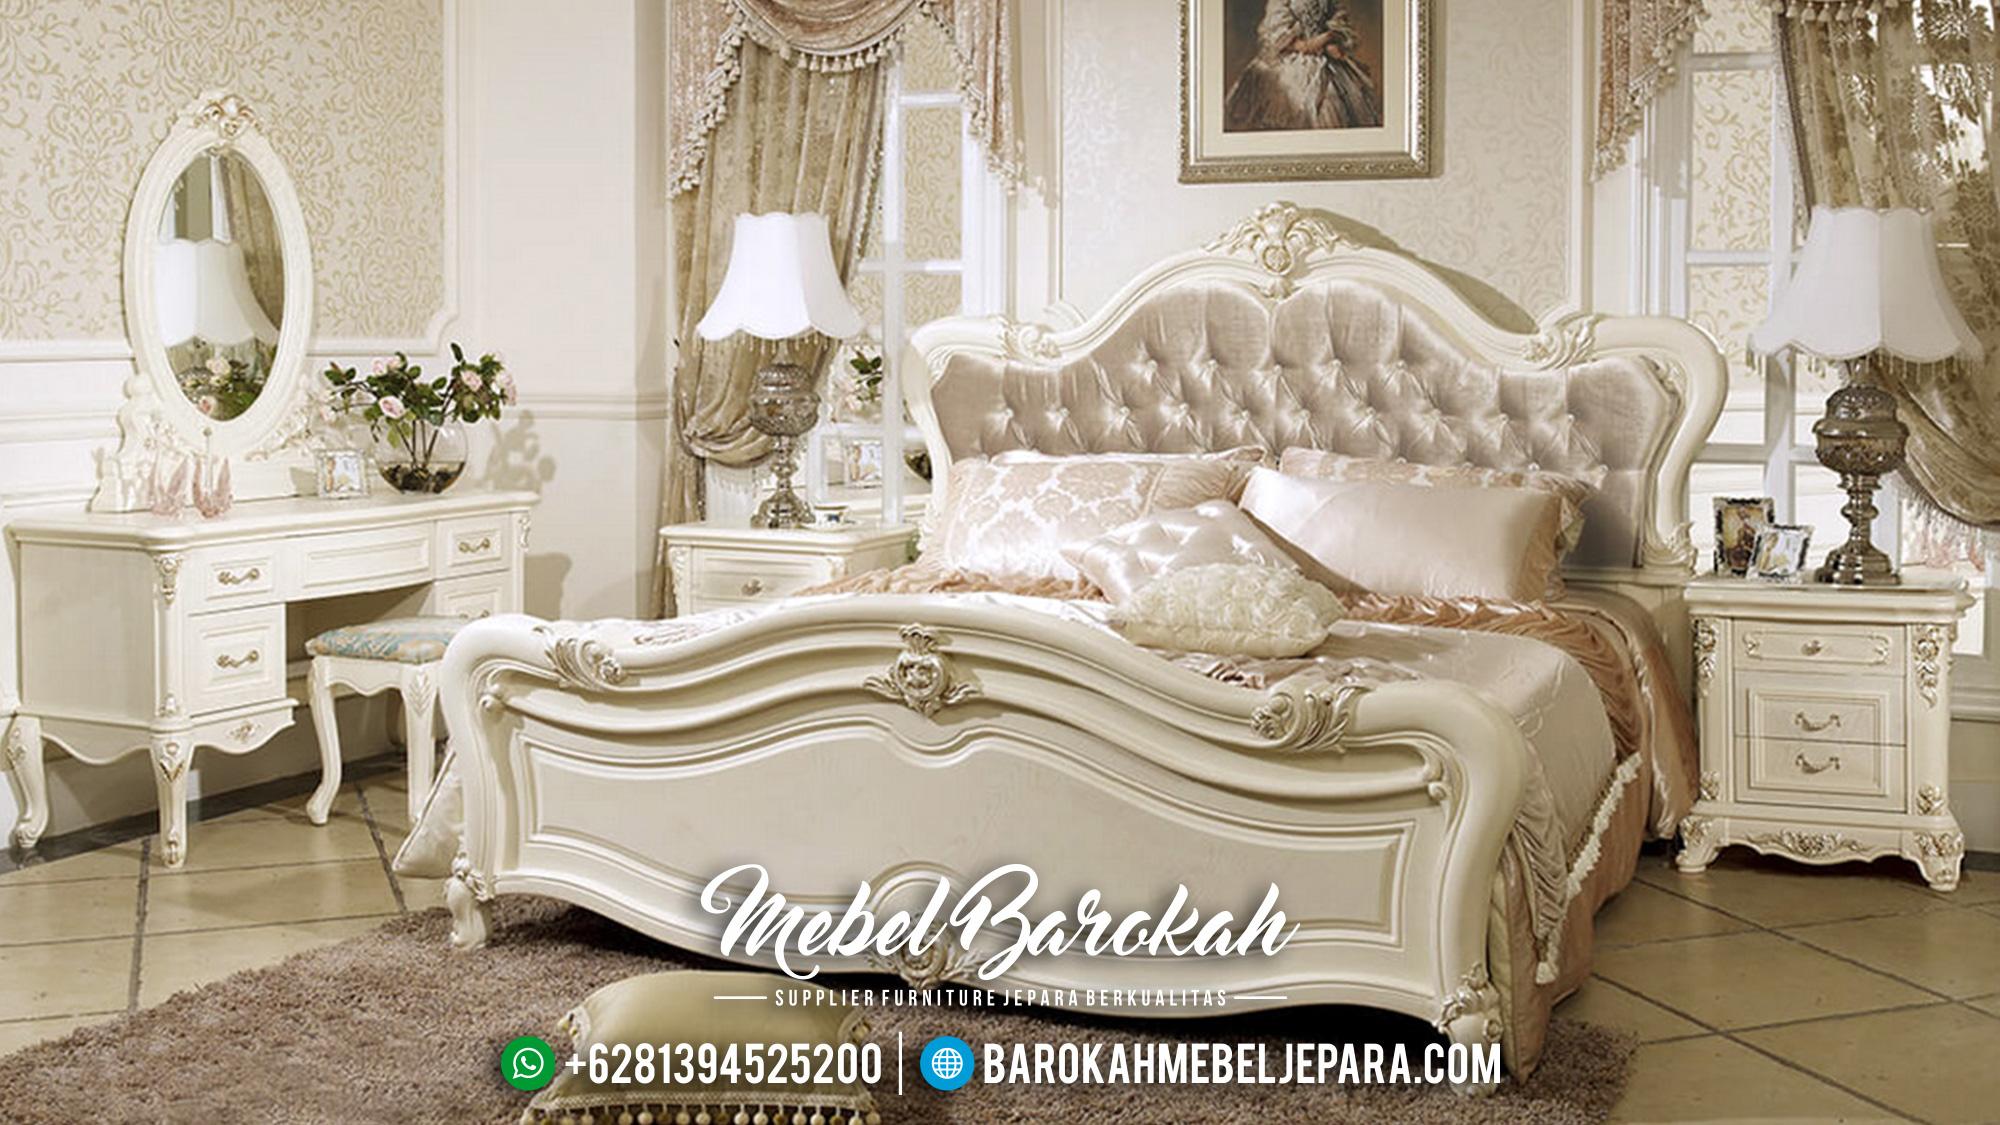 Set Kamar Tidur Klasik Mewah Terbaru Jepara Shaen Krov MB-004